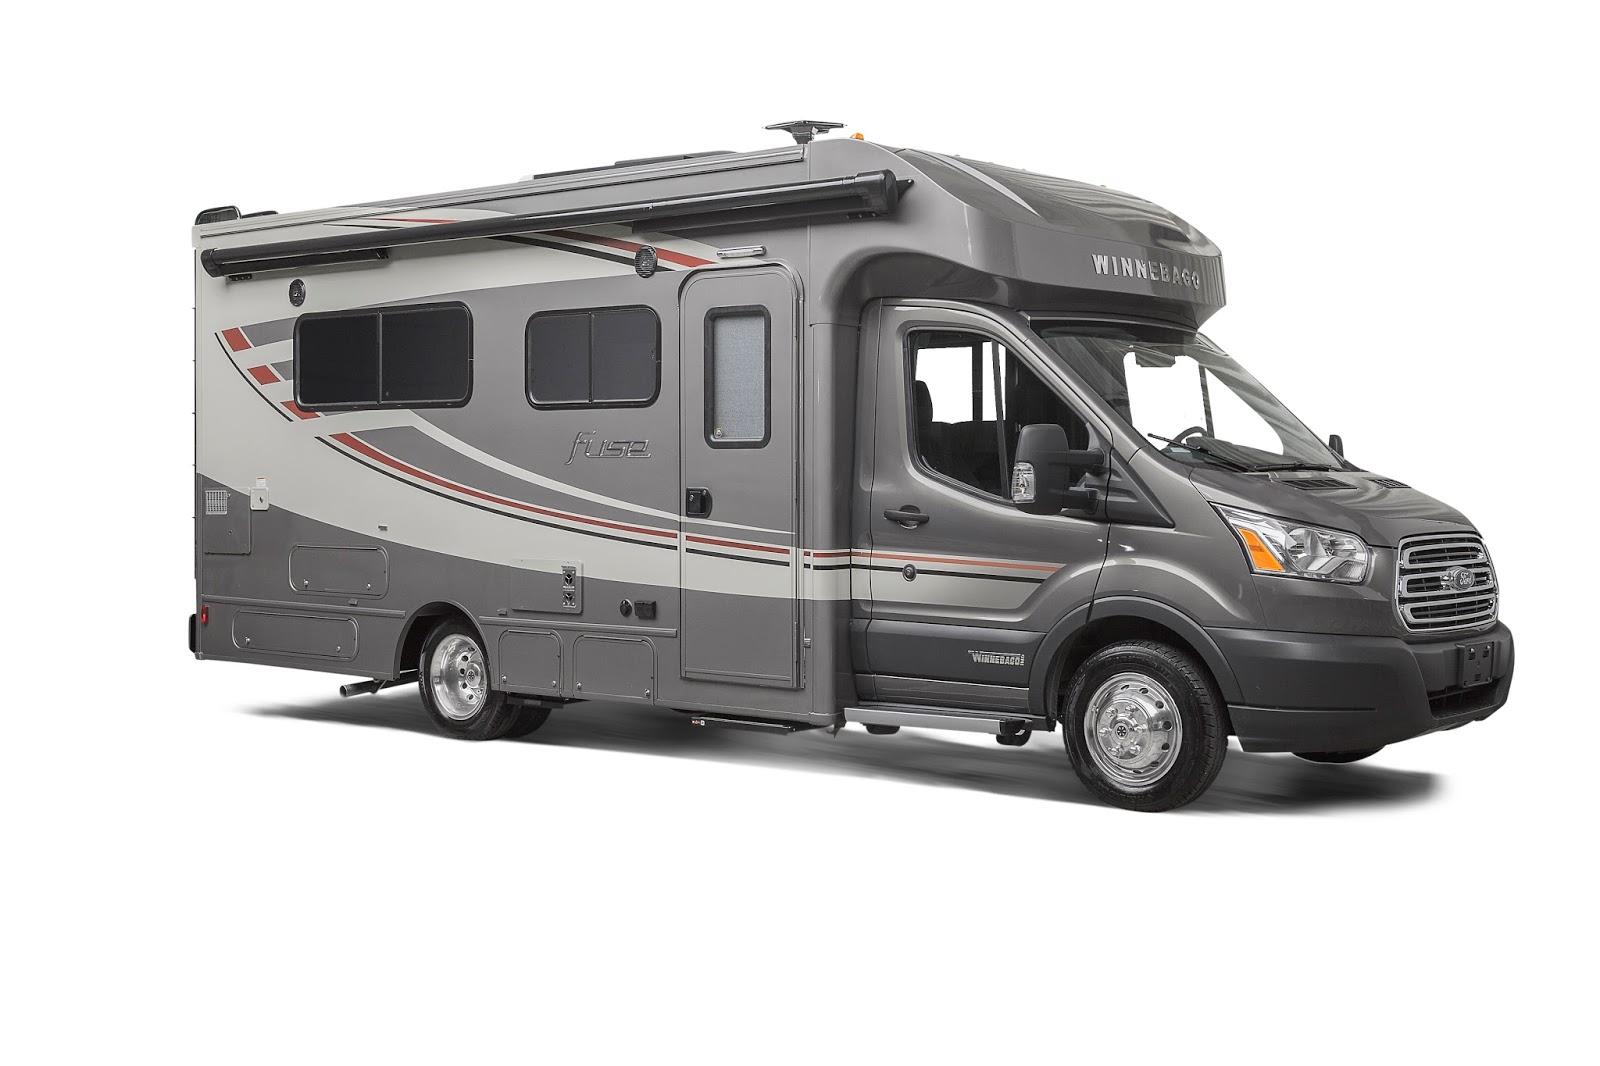 Ford Transit Platform to Grow RV Presence in '16 RV